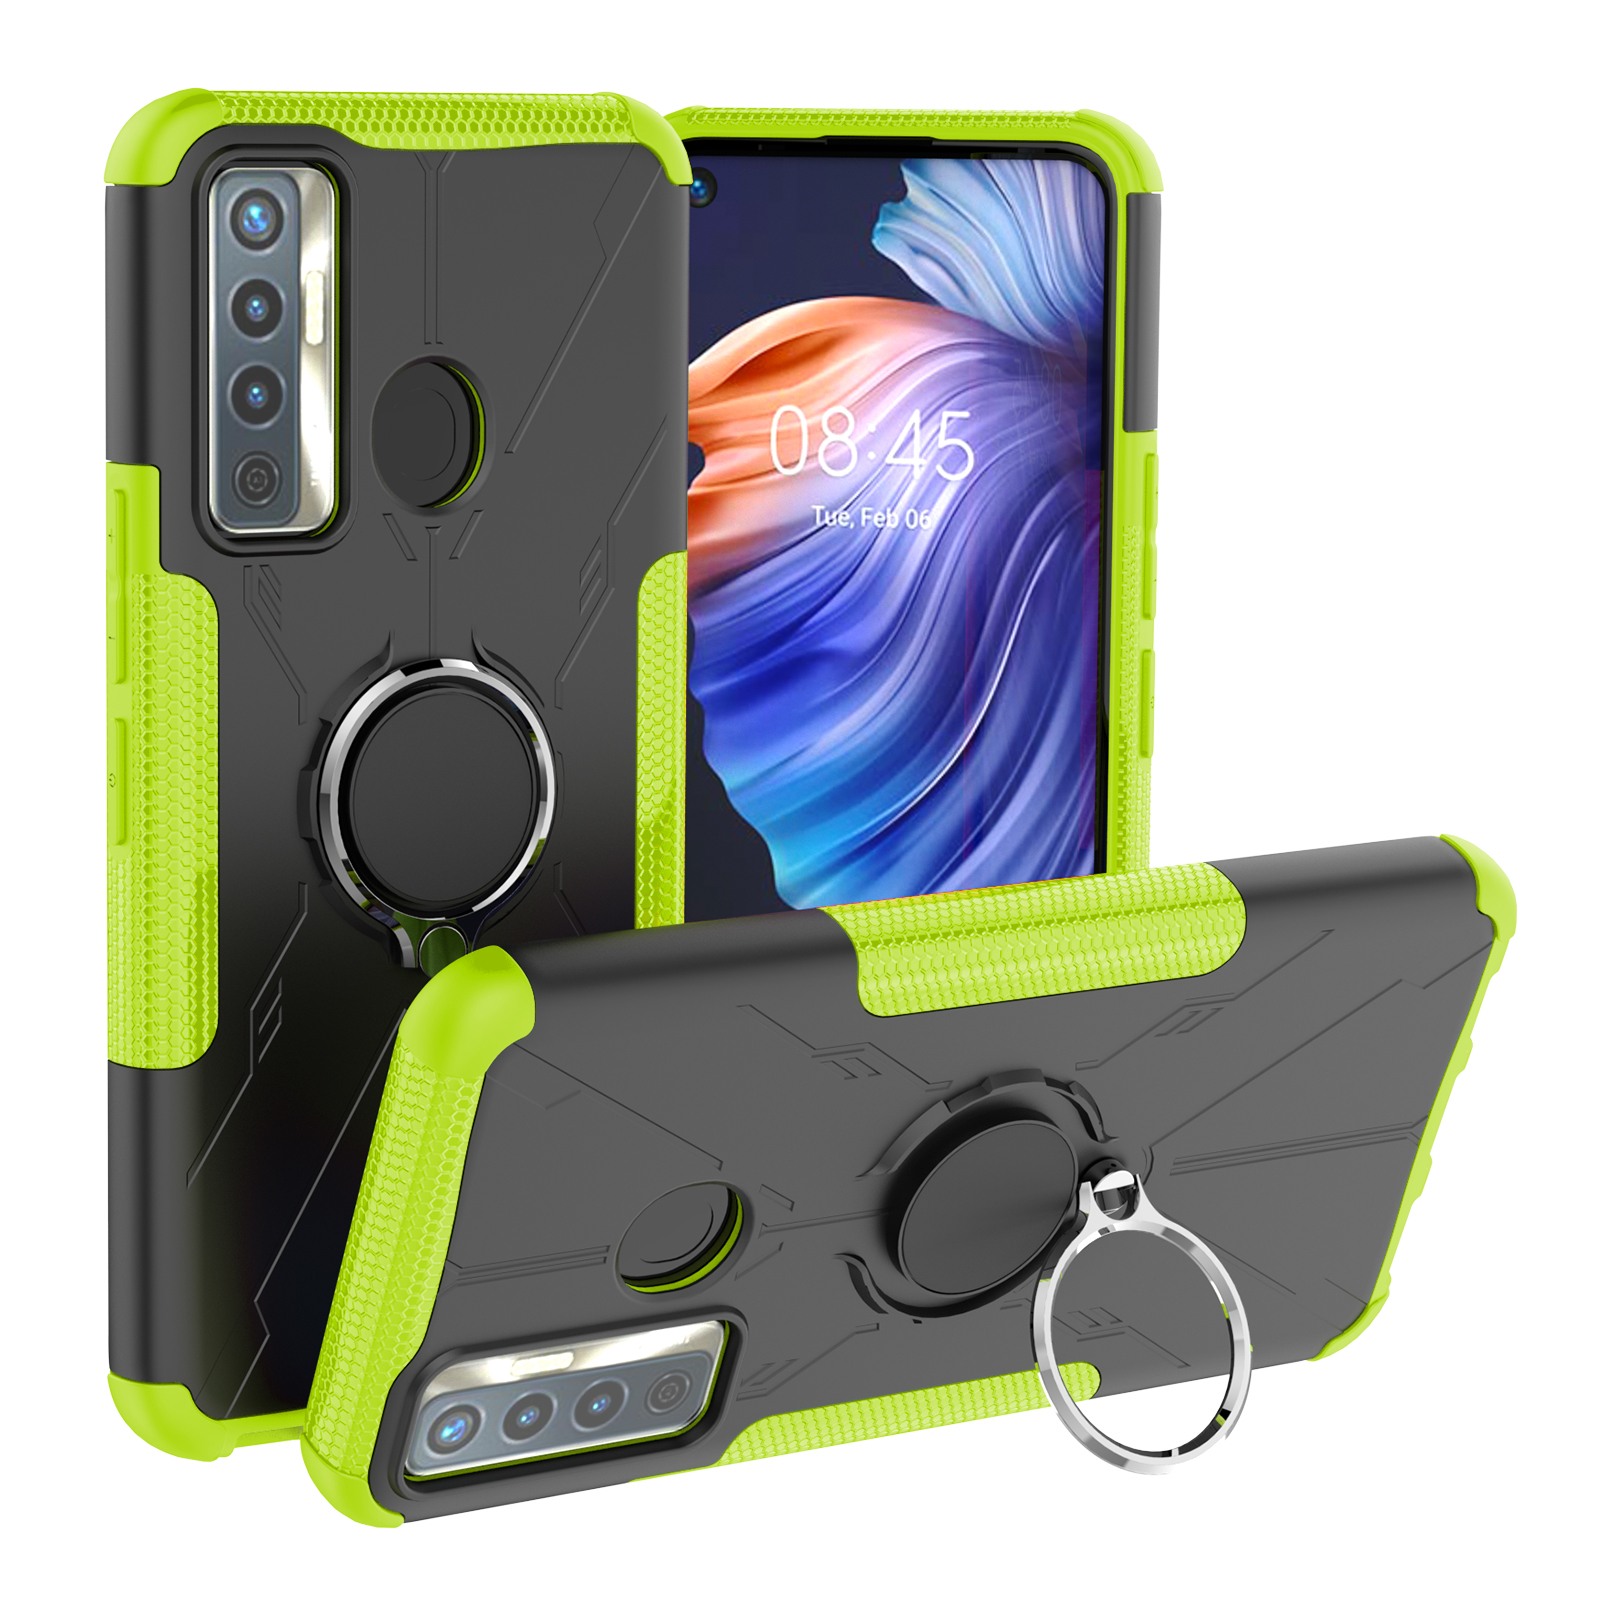 Mecha Phone Case For Tecno Camon 17